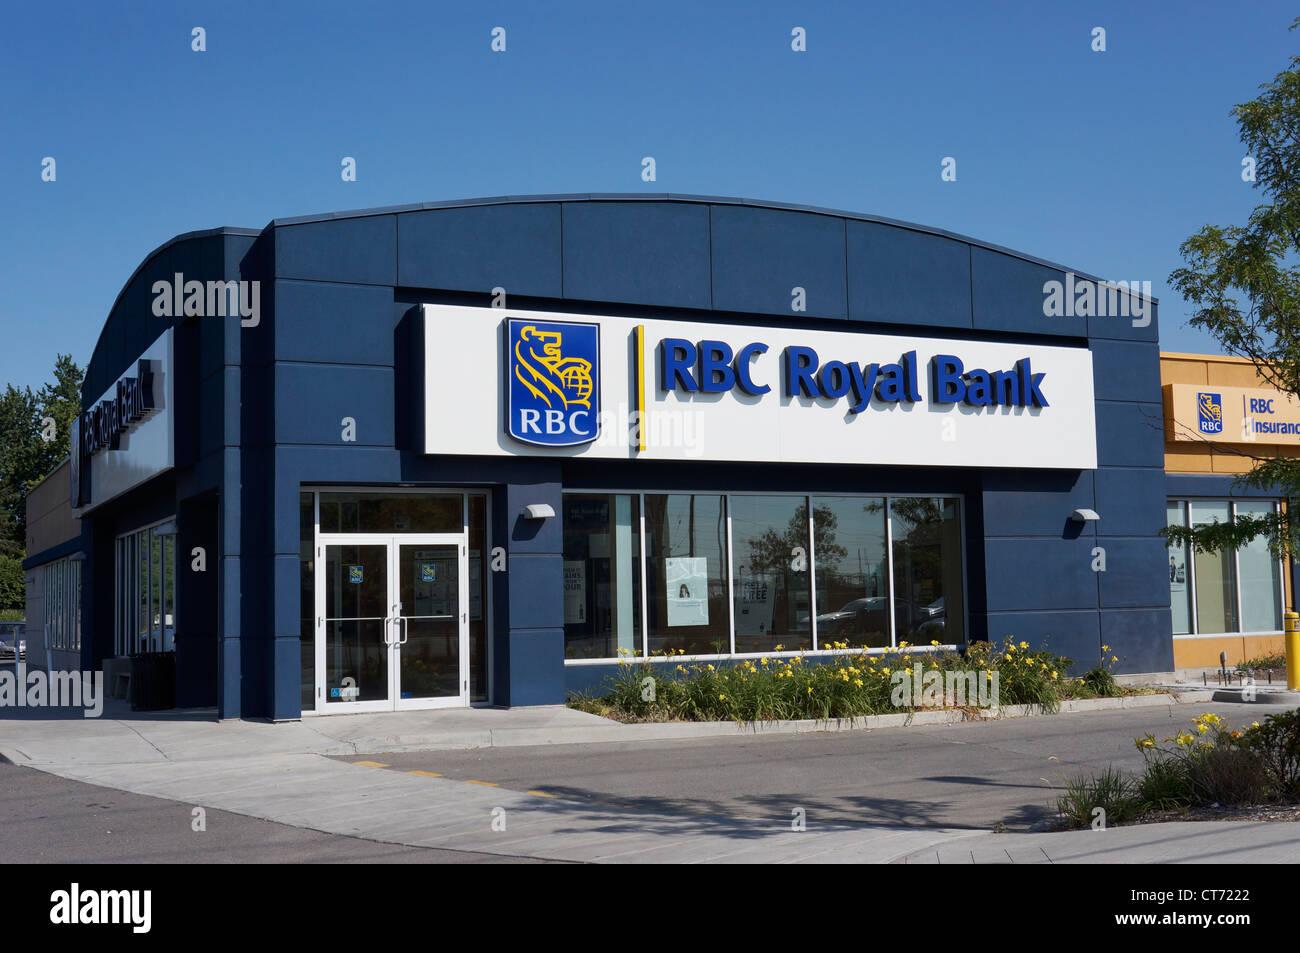 Lokale Niederlassung Royal Bank of Canada, Versicherung Stockbild